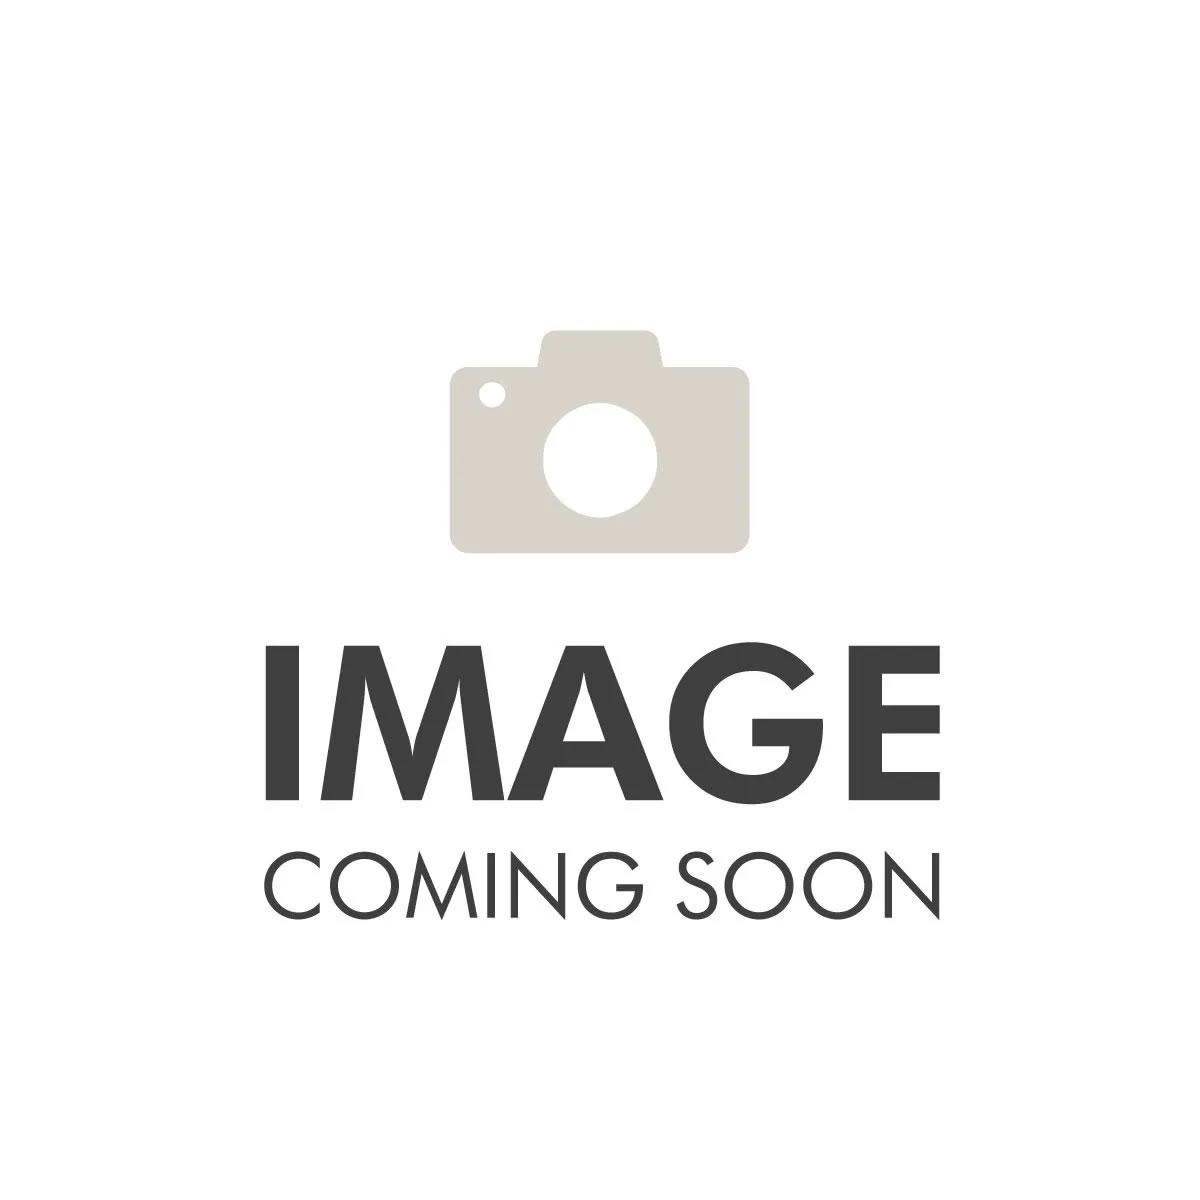 Mini-Van Console, Charcoal